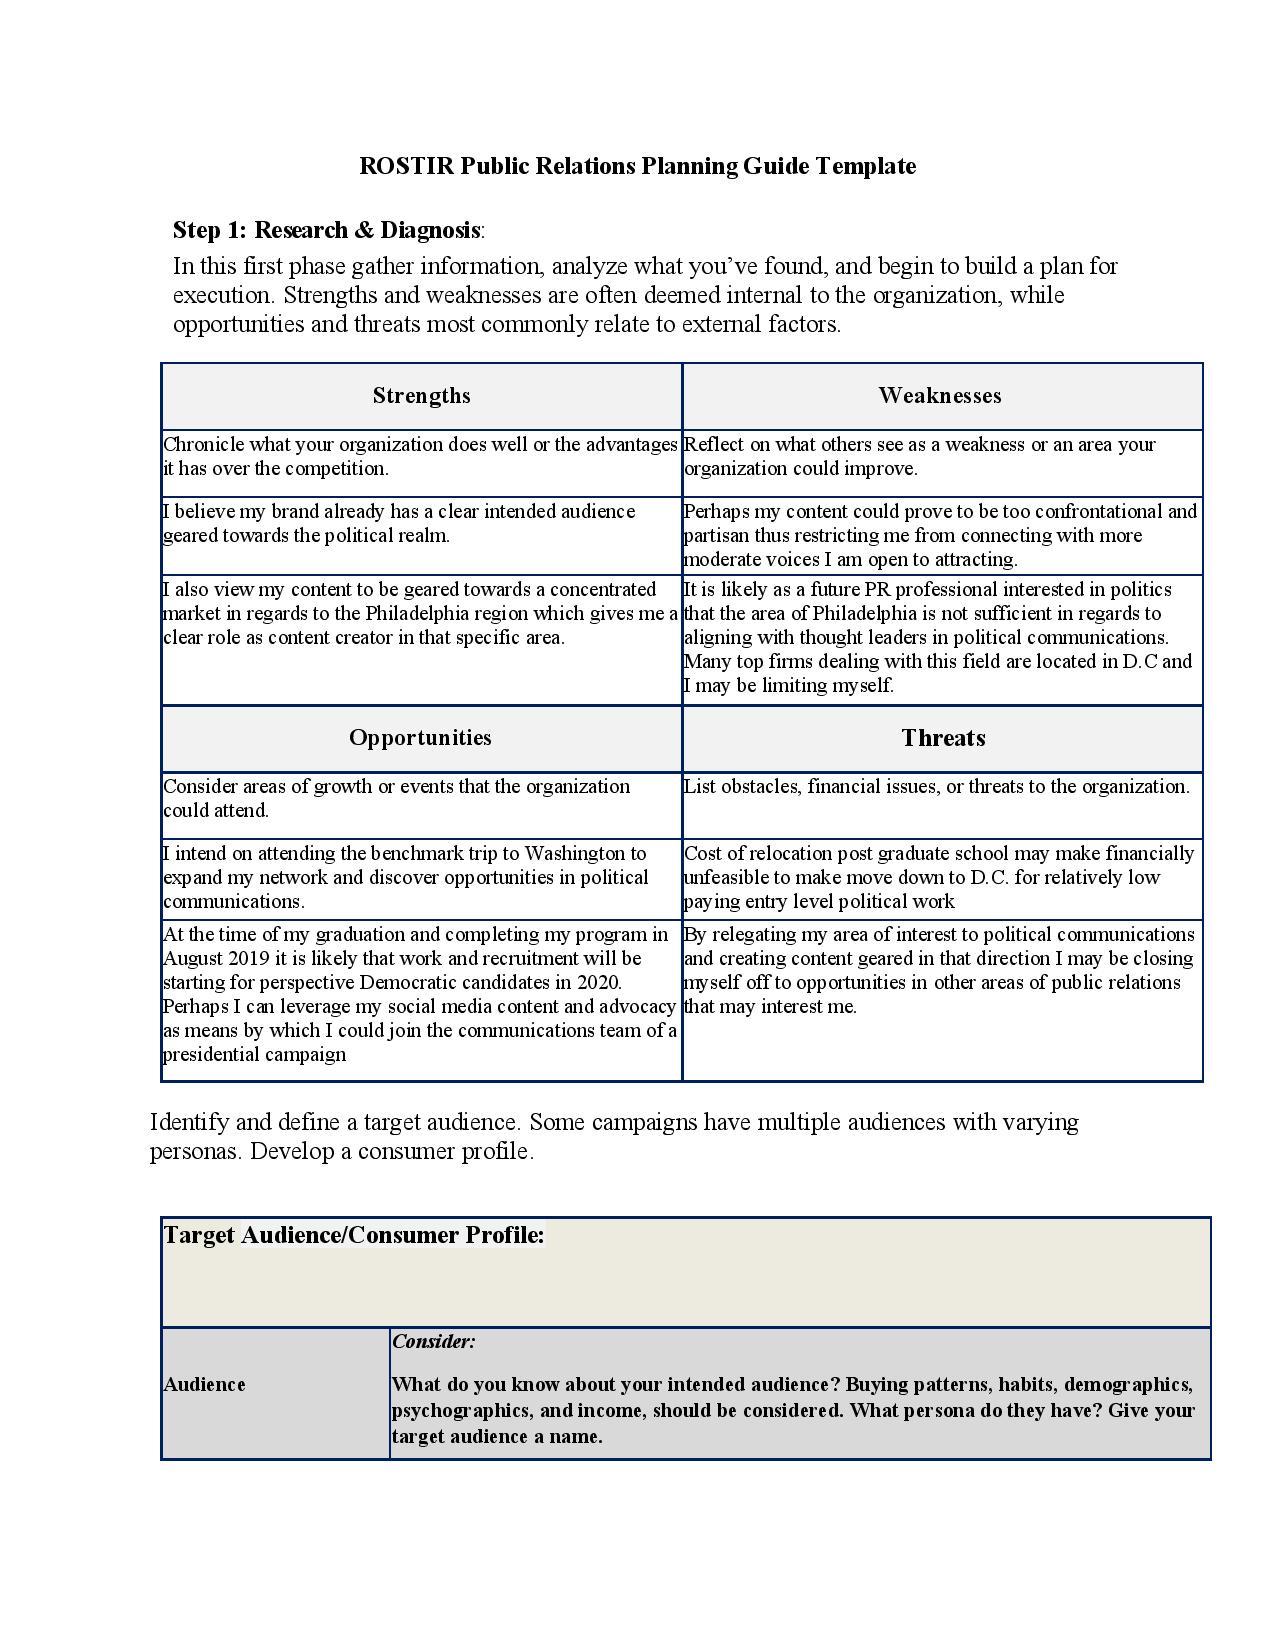 Esl academic essay proofreading services online